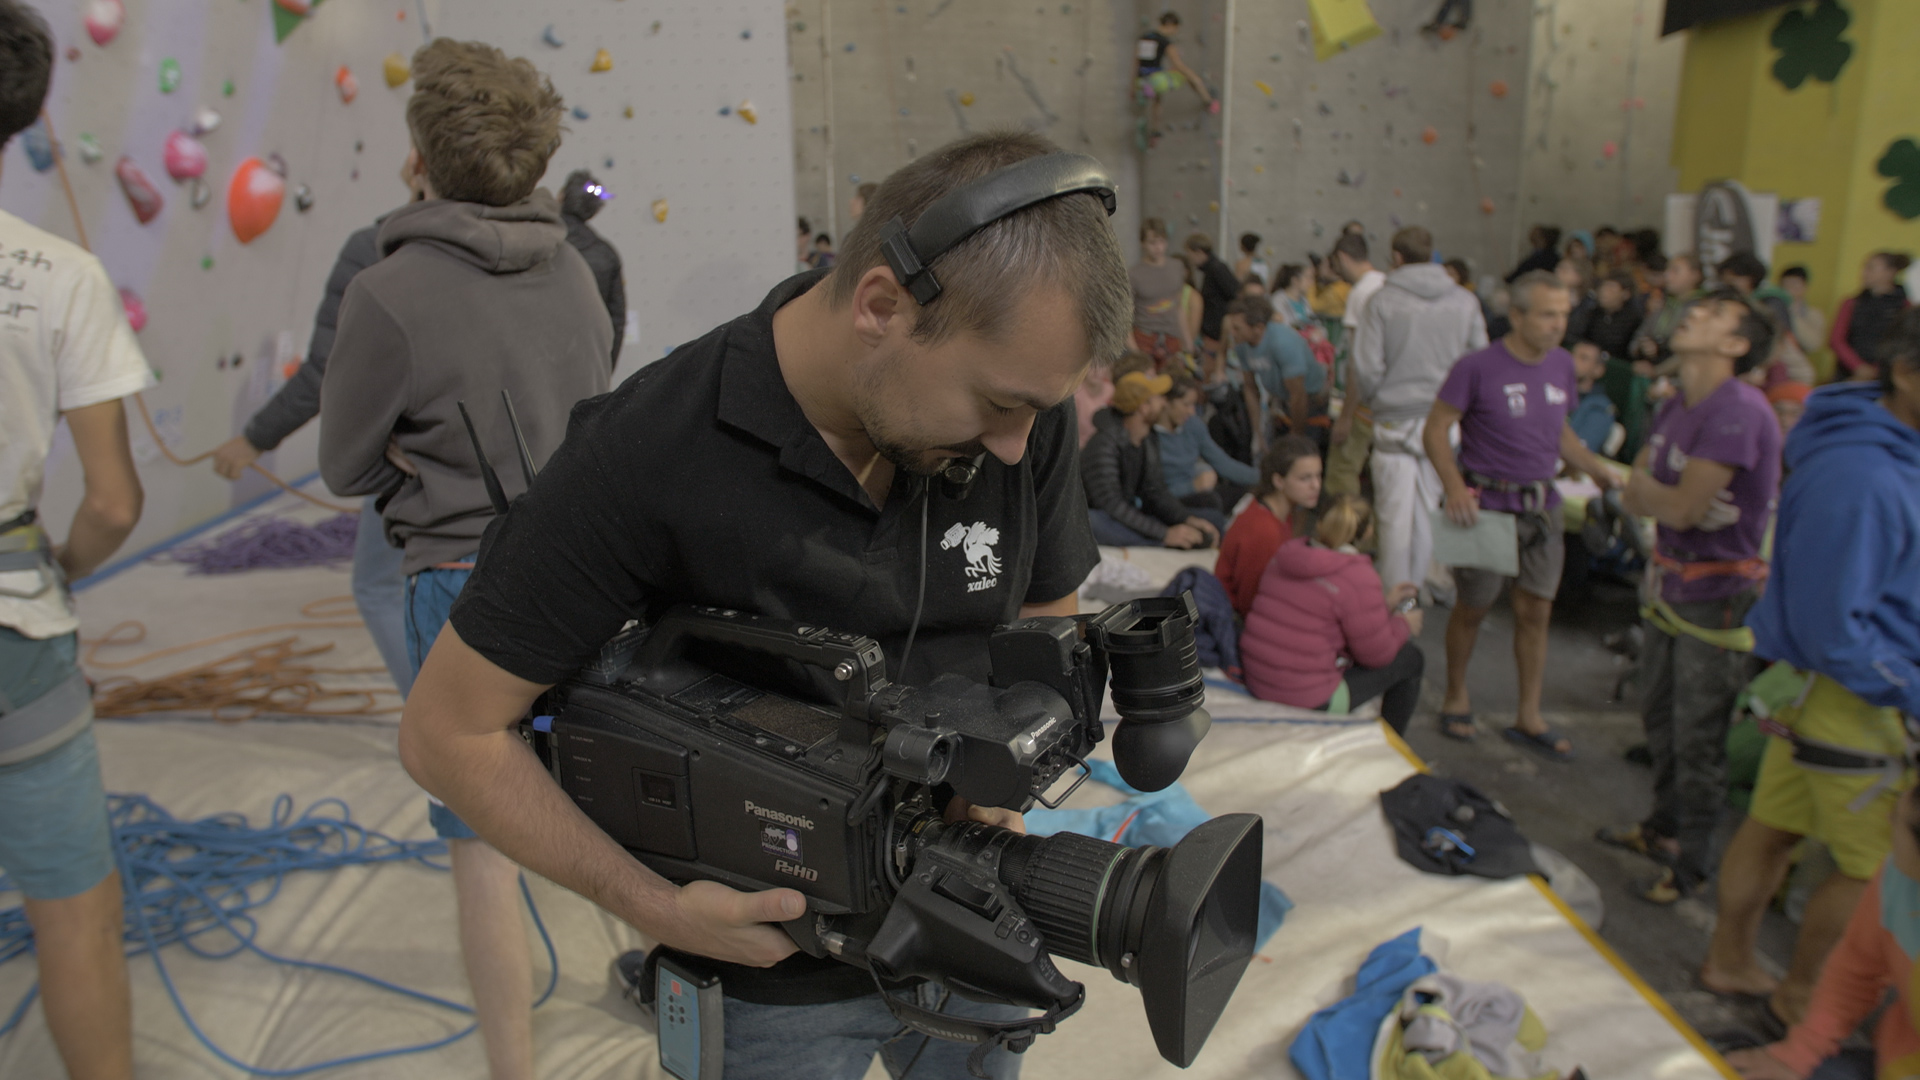 leo-meslet-xaleo-cadreur-live-video-tournage